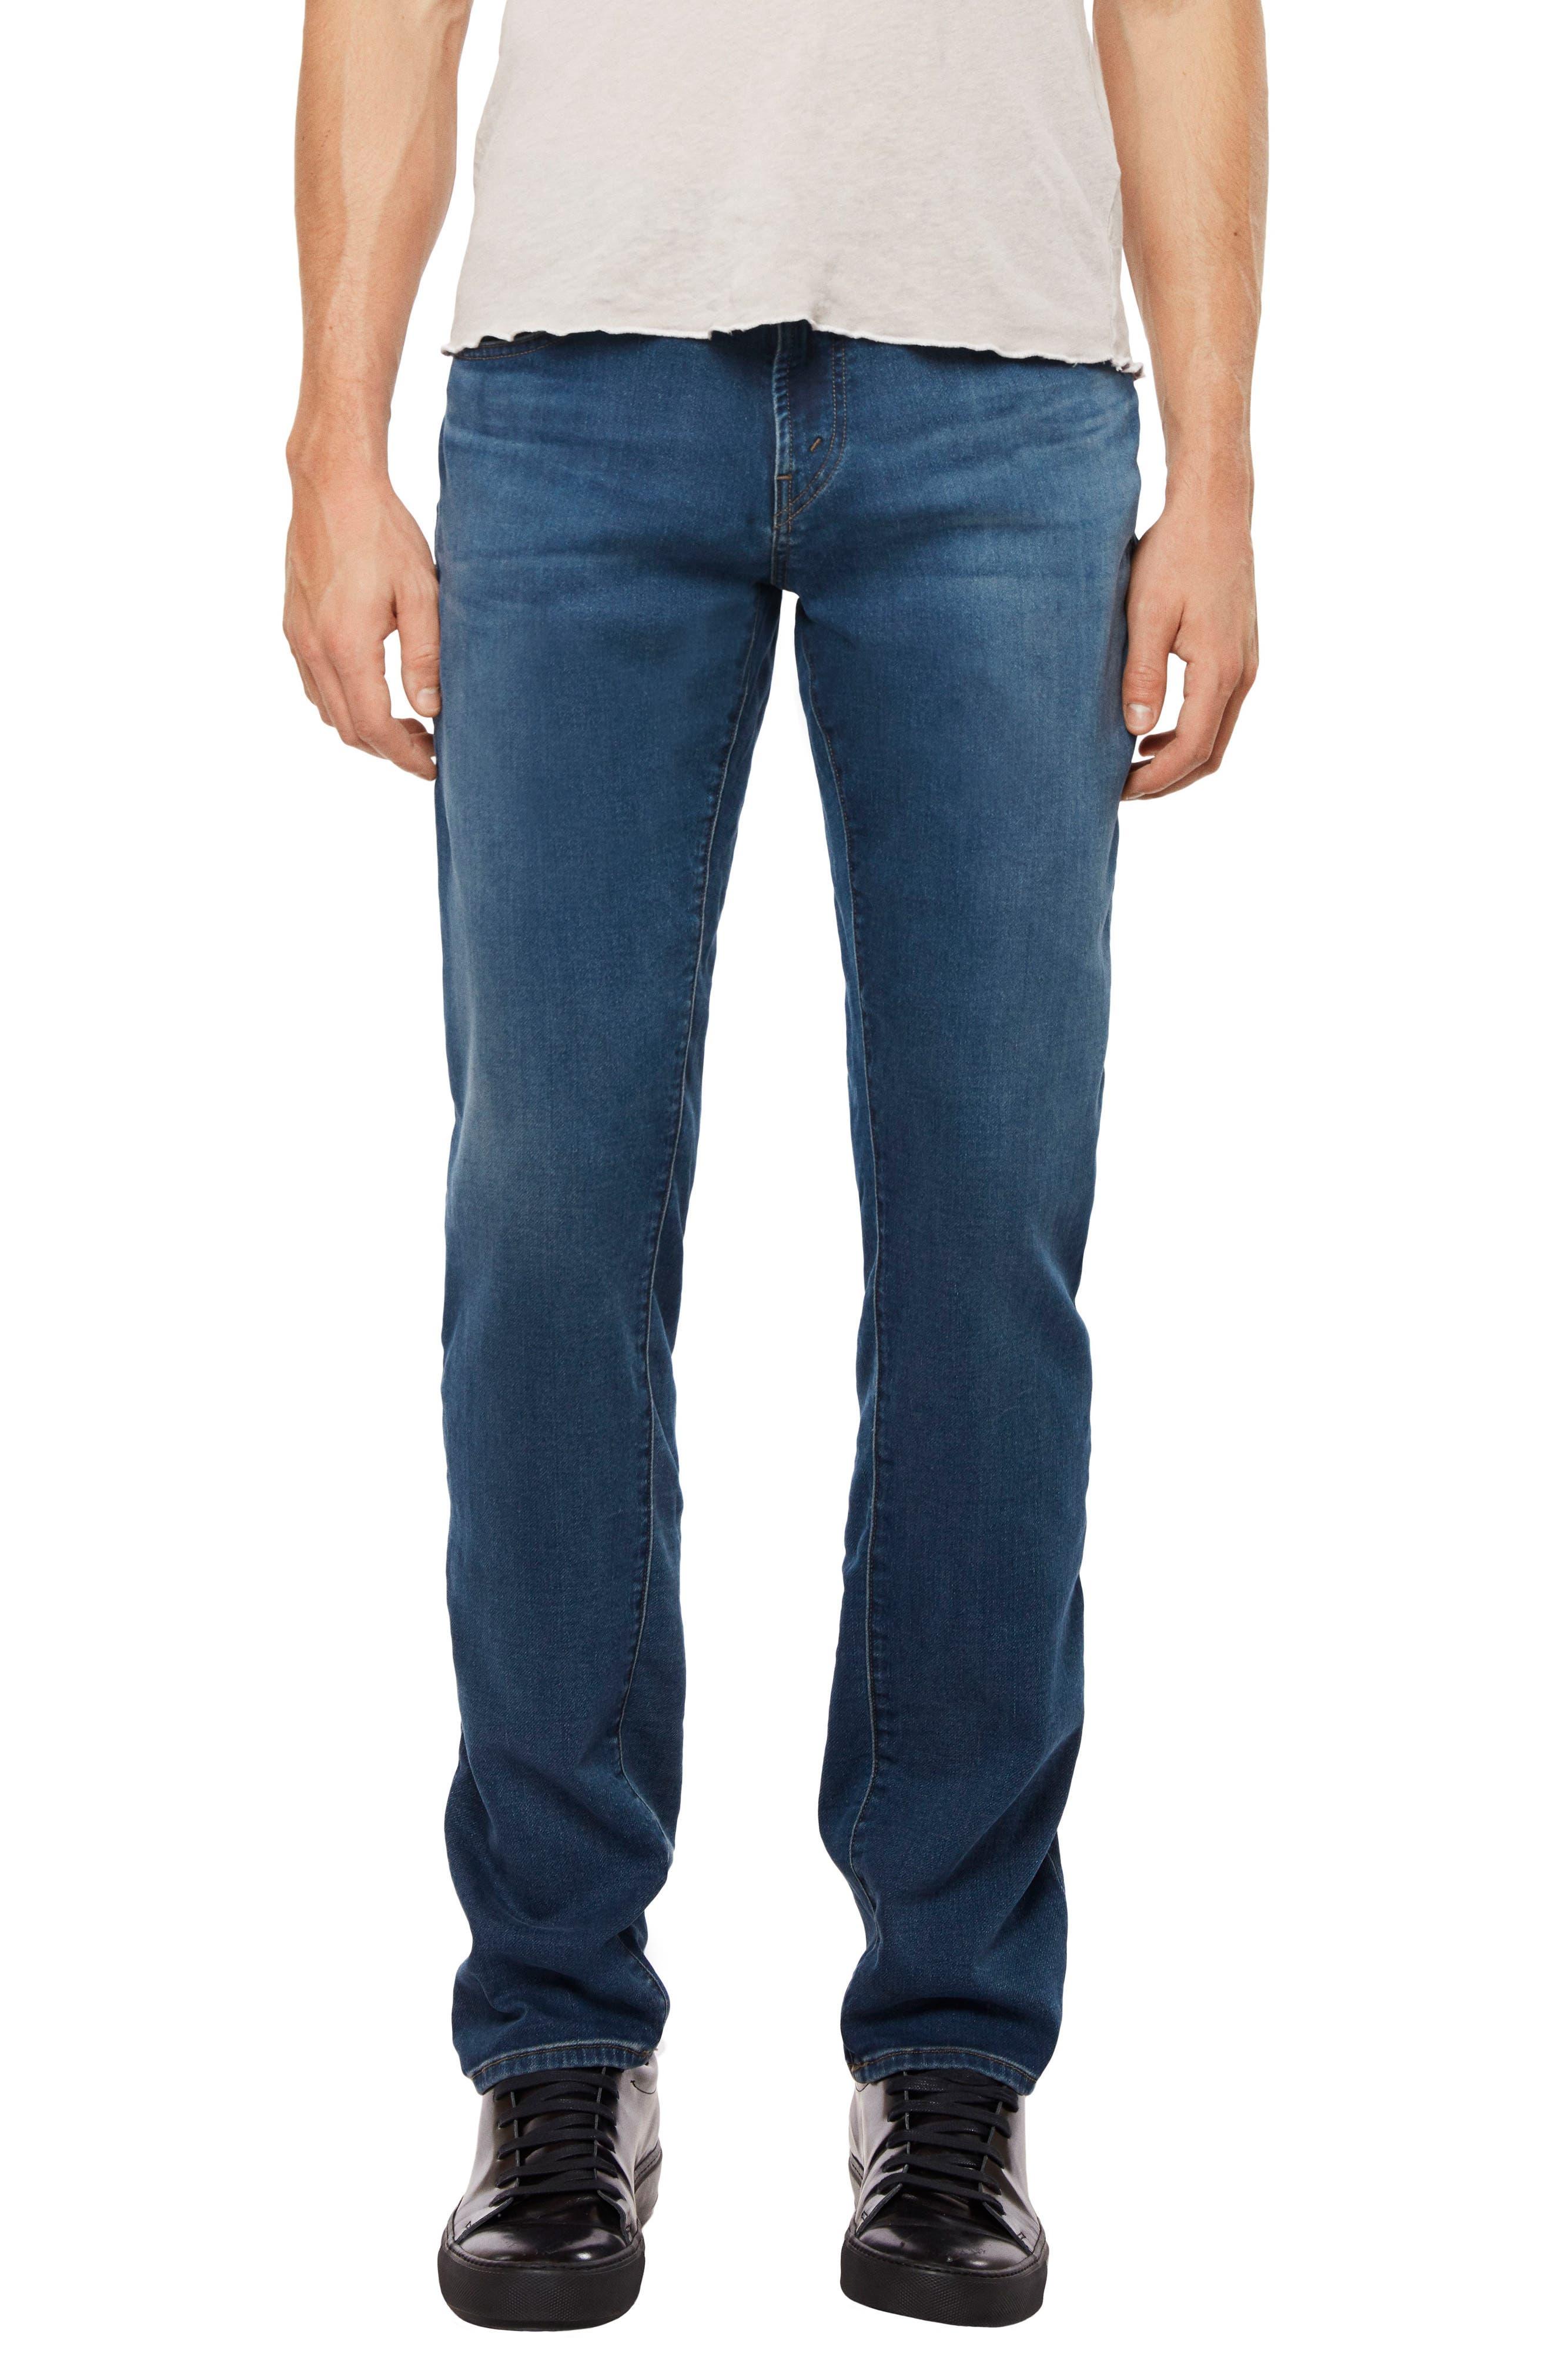 Kane Slim Straight Leg Jeans,                         Main,                         color, 454